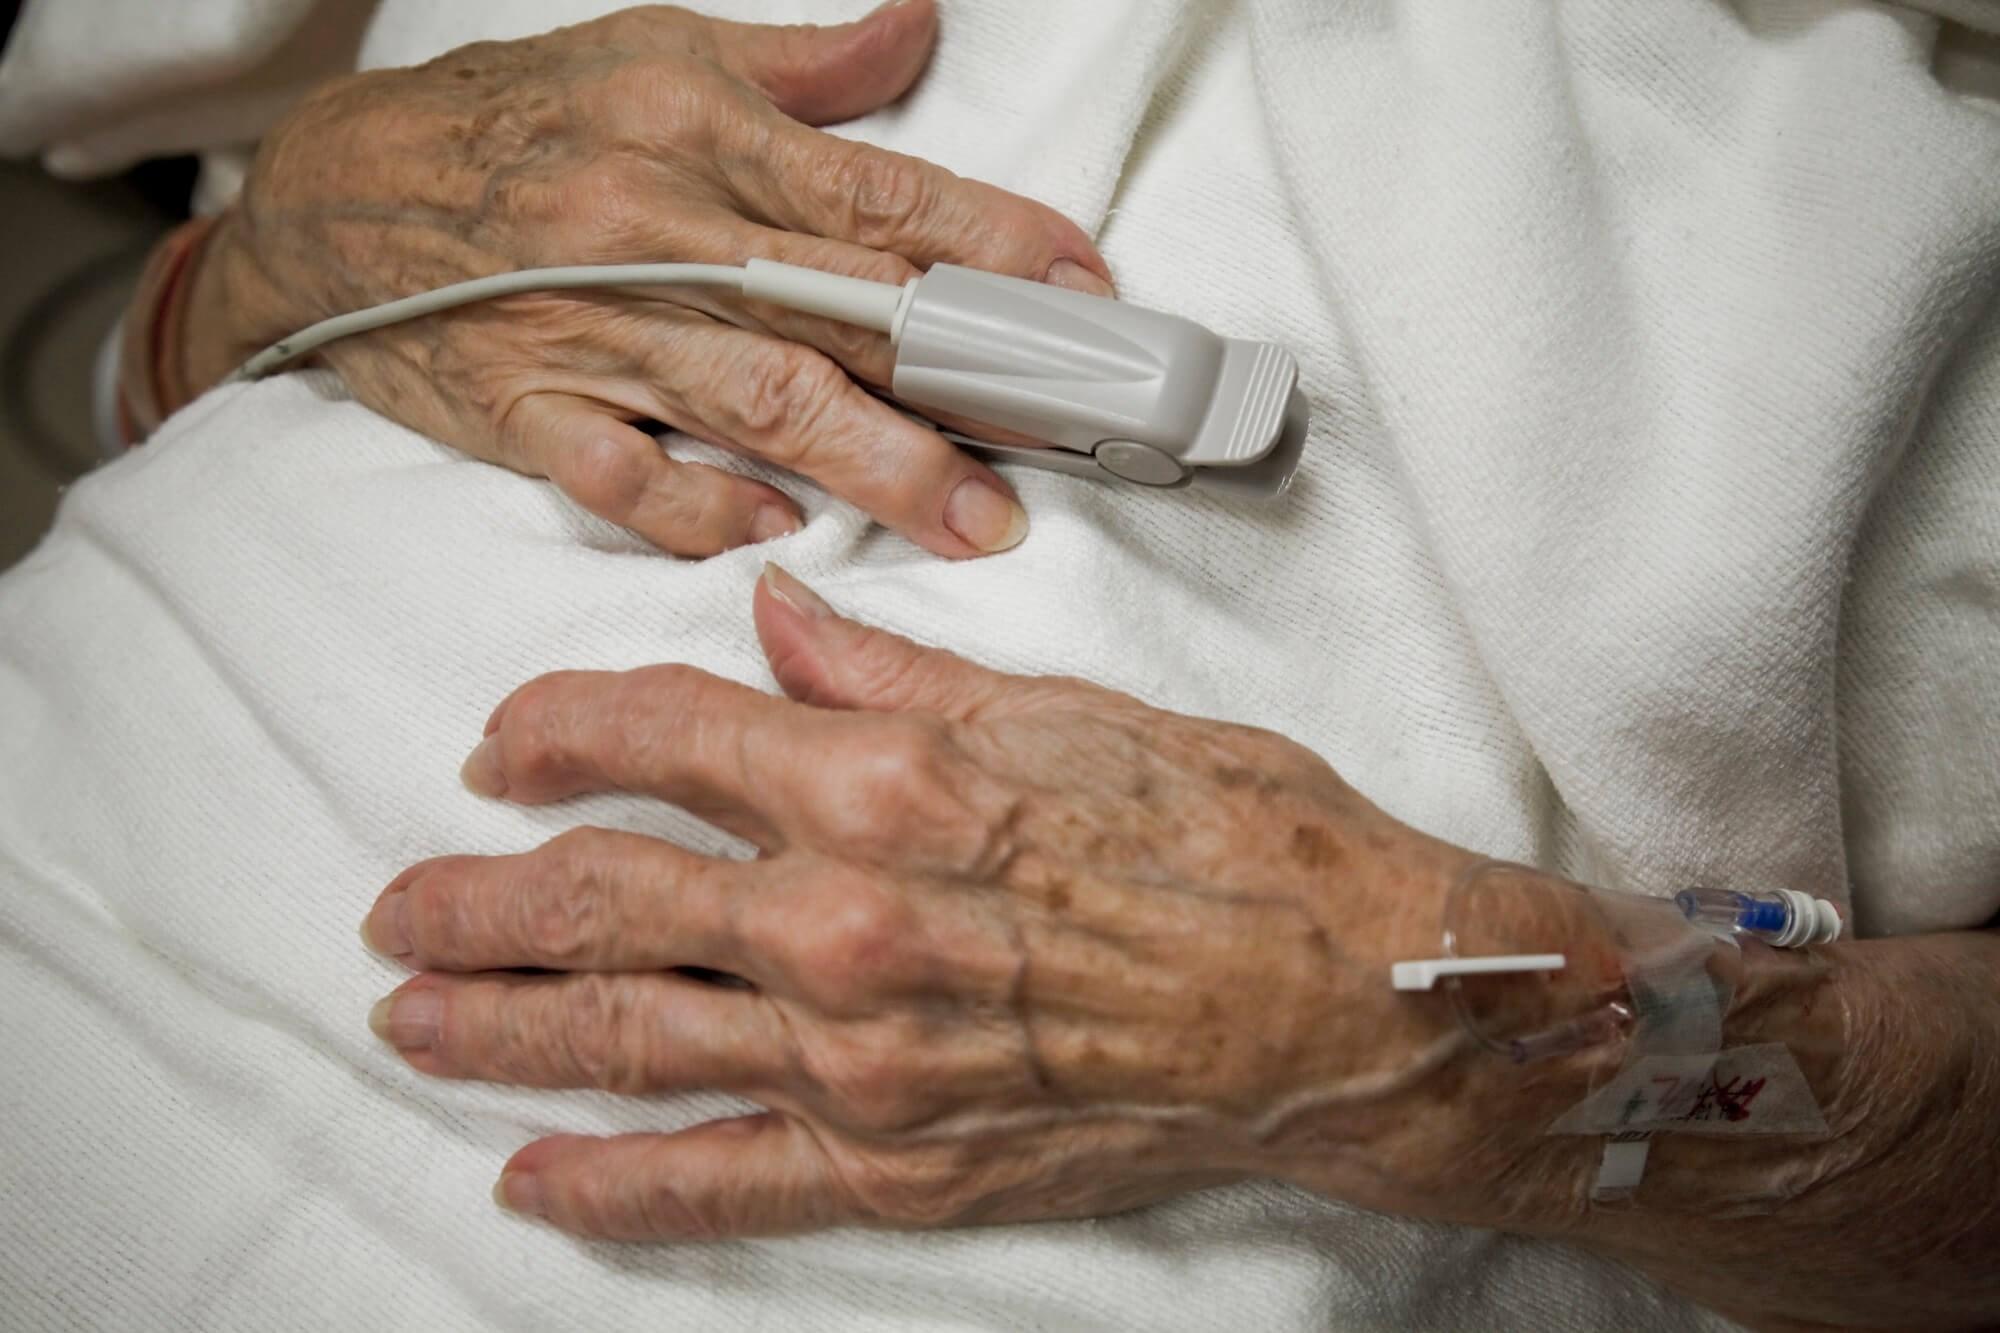 Frailty Linked to Increased Bleeding Risk in Acute Myocardial Infarction